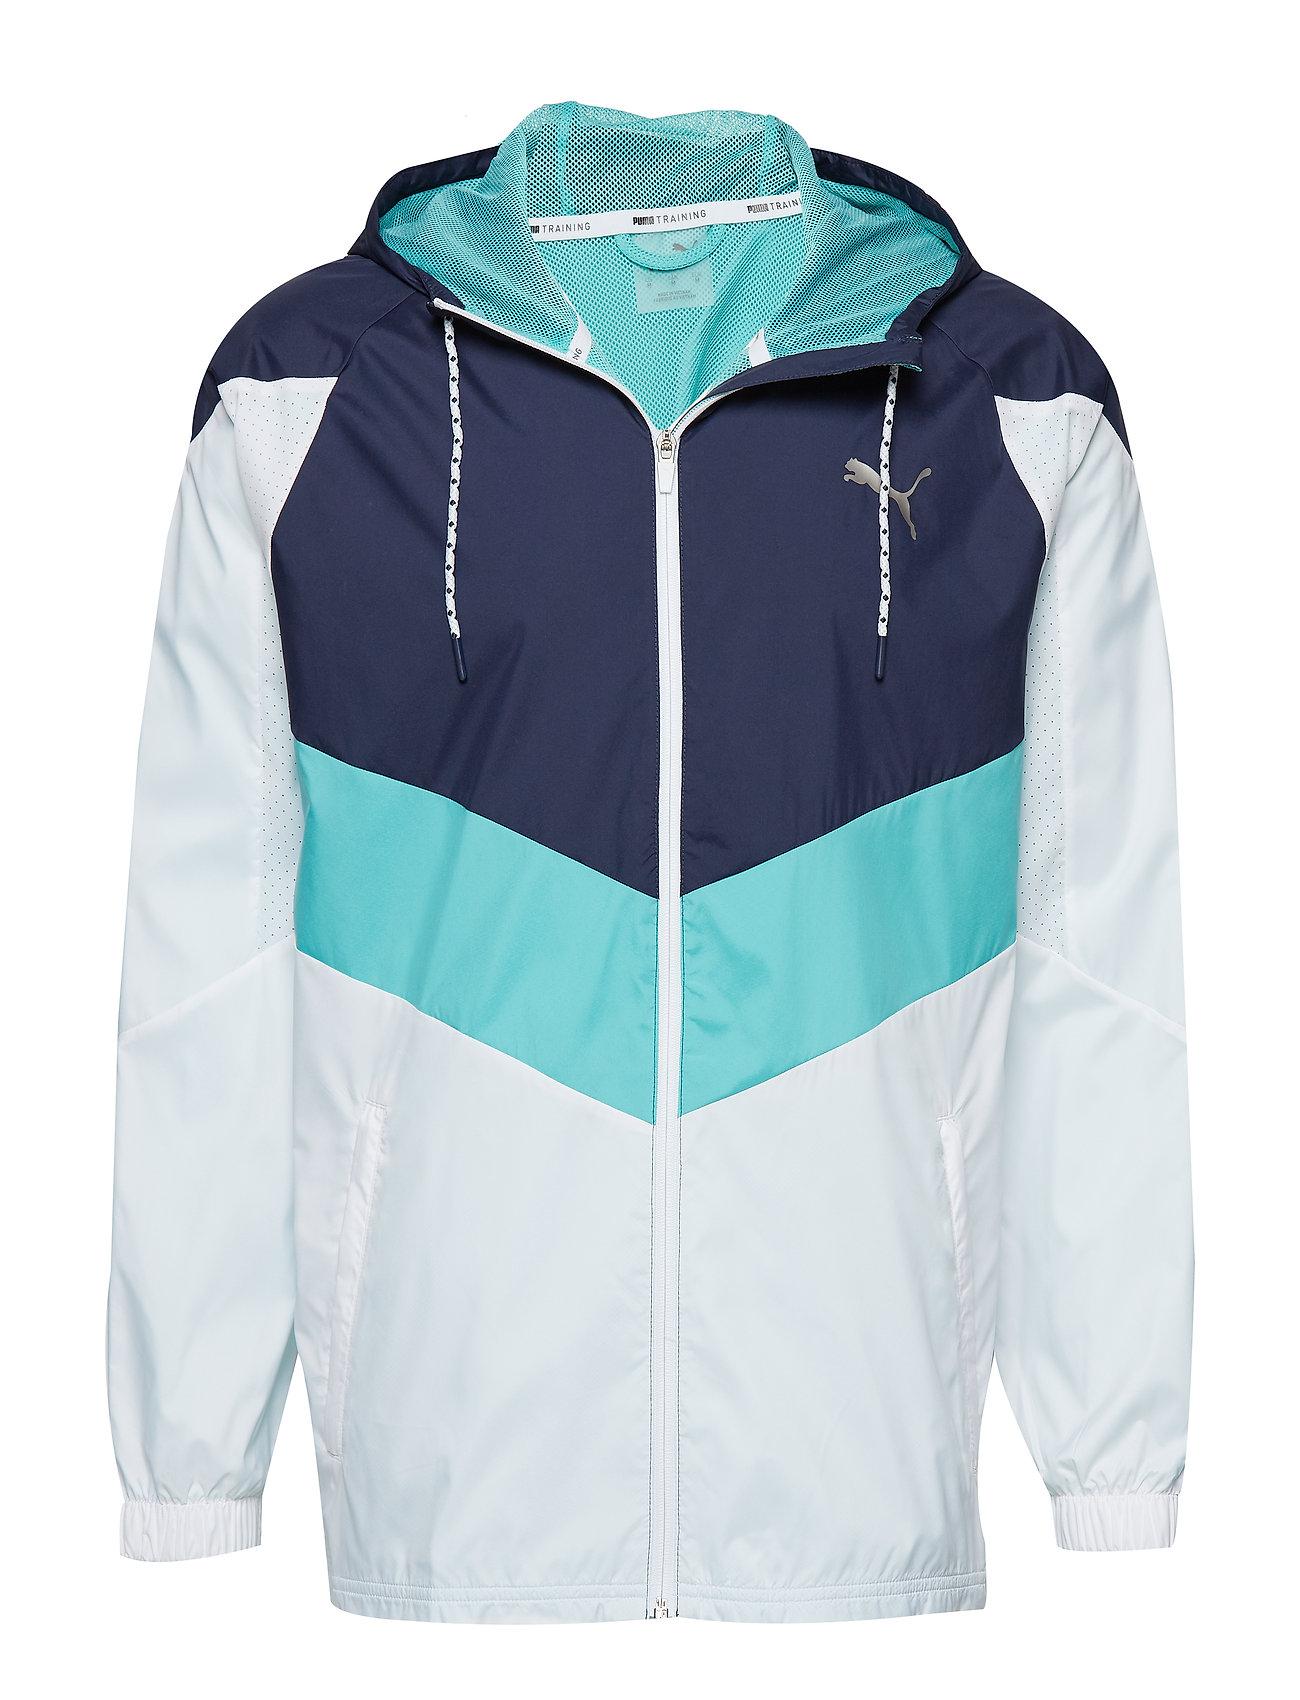 PUMA Reactive Wvn jacket - PUMA WHITE-PEACOAT-BLUE TURQUOISE